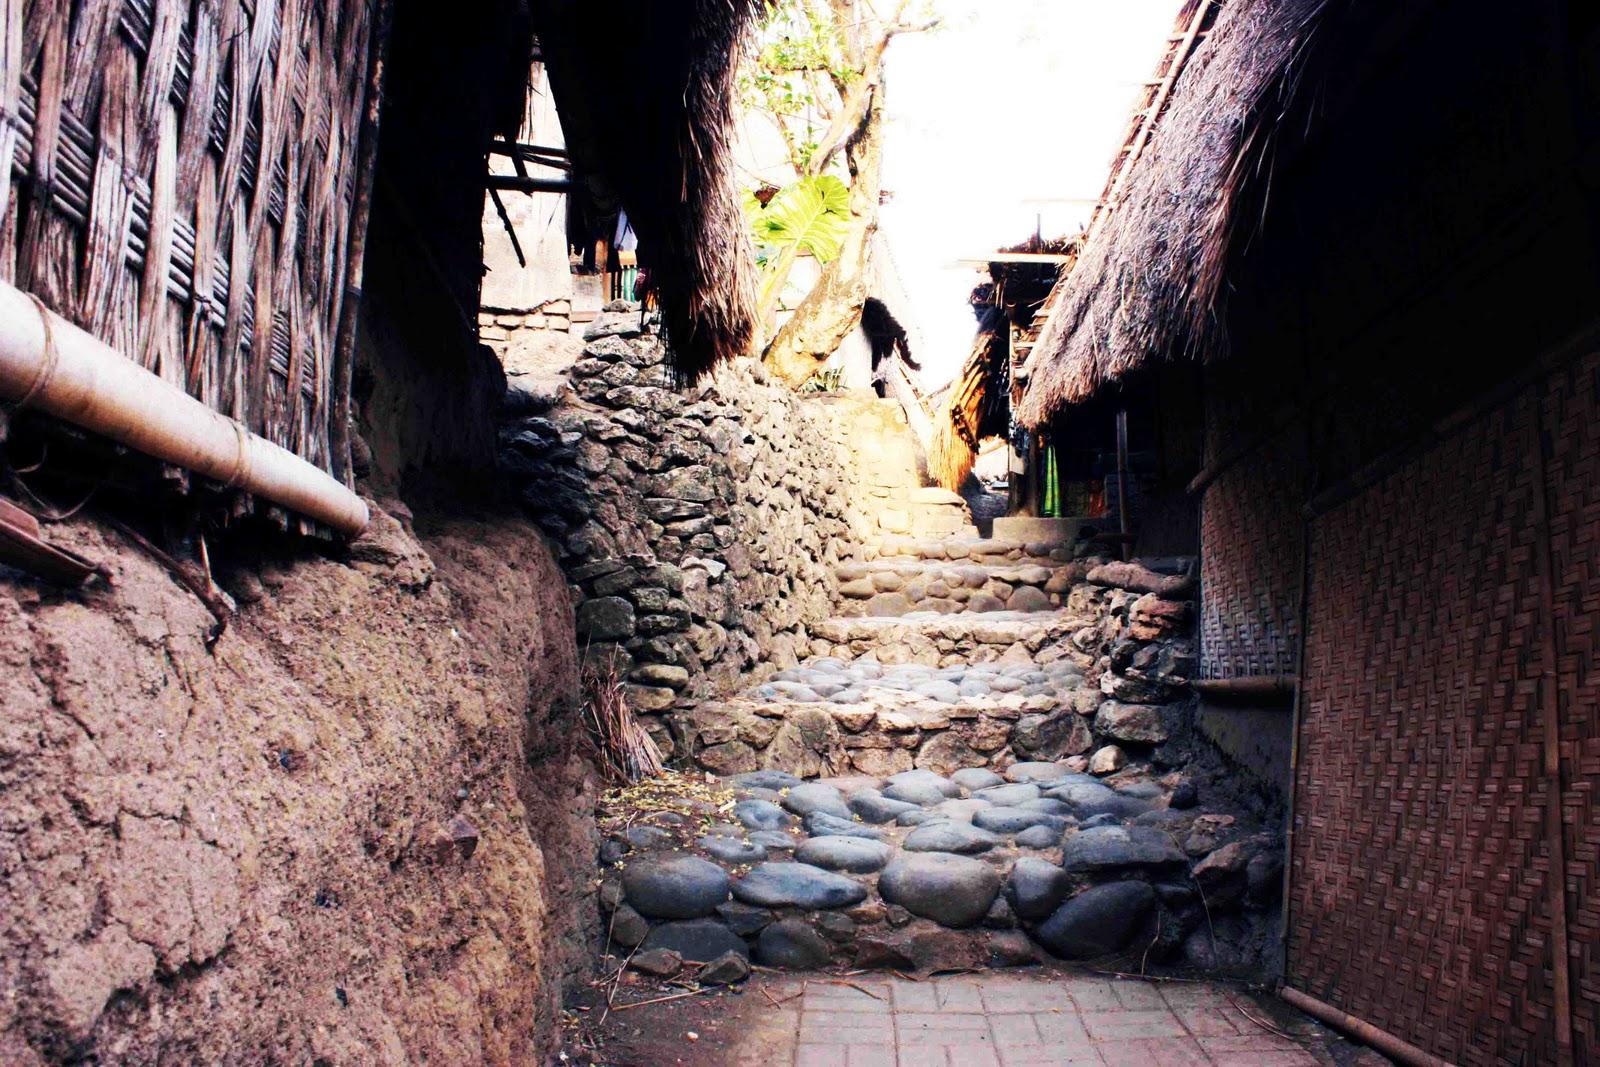 Backpacker Desa 1 Sade Bertanggakan Batu Rumah Adat Kab Lombok